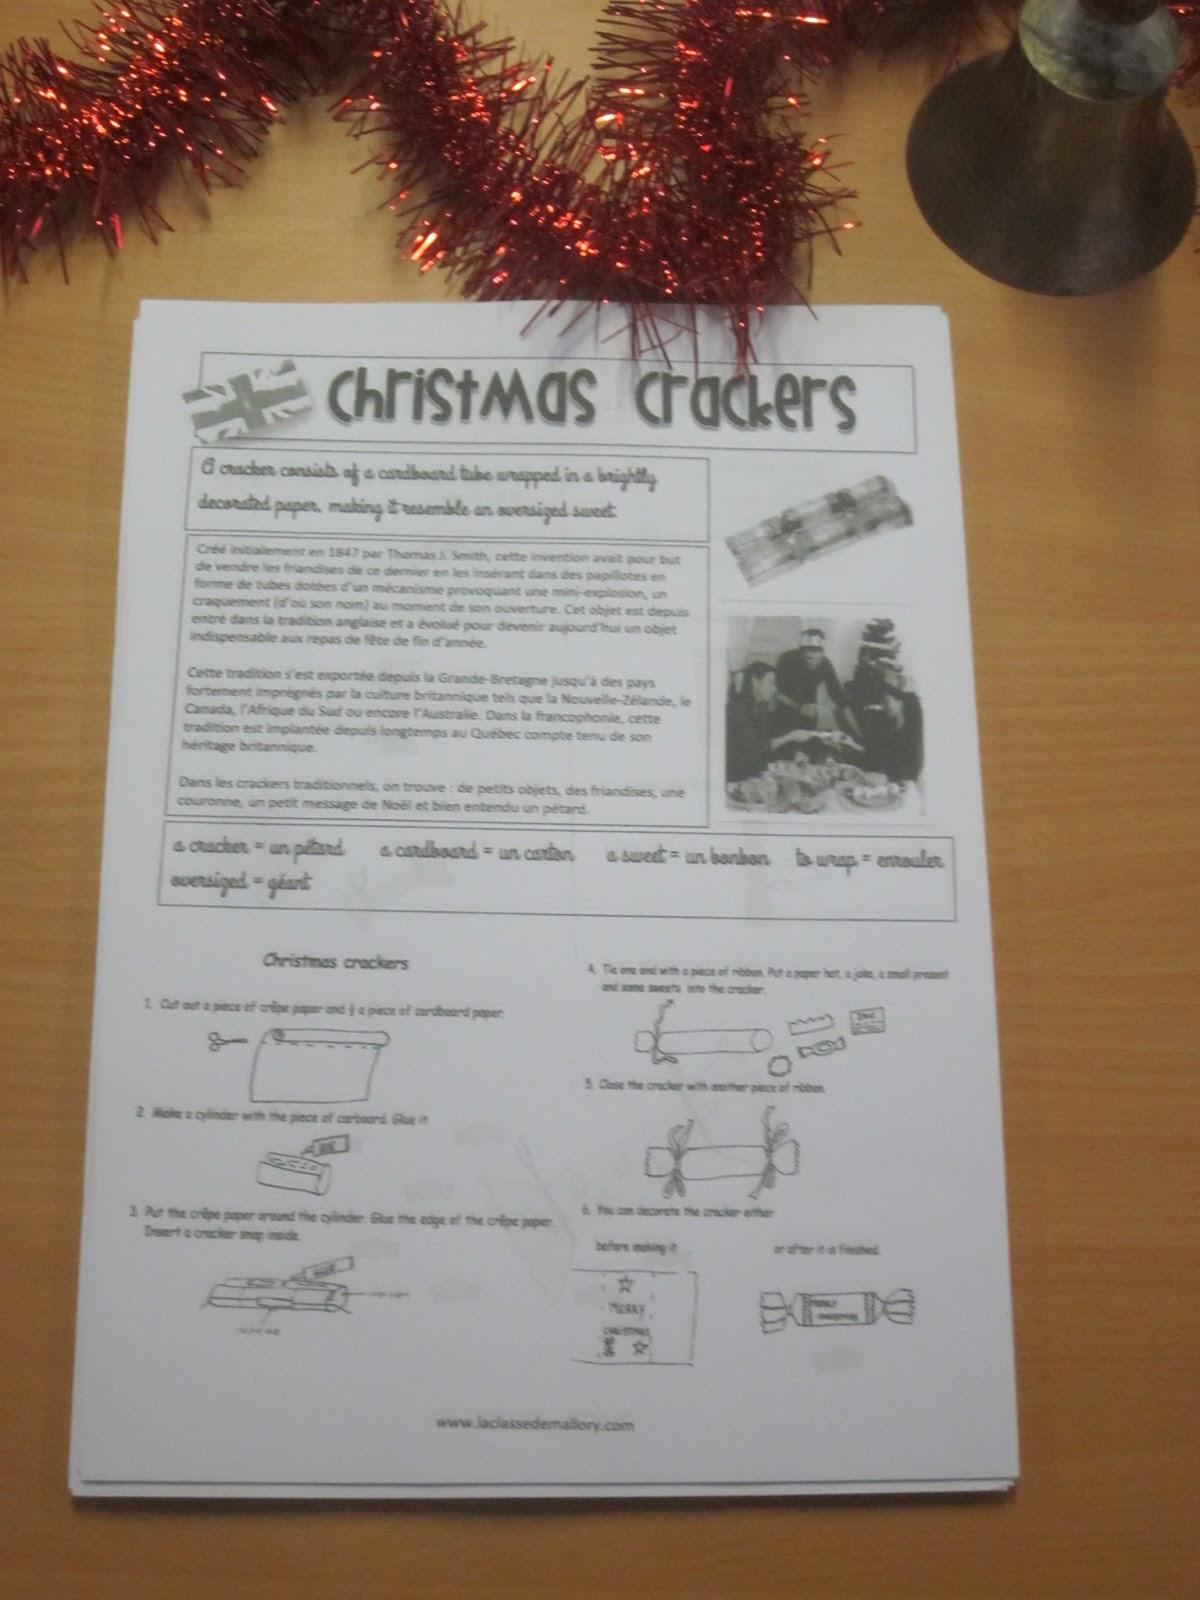 Les Traditions De Noel En Australie merry christmas!